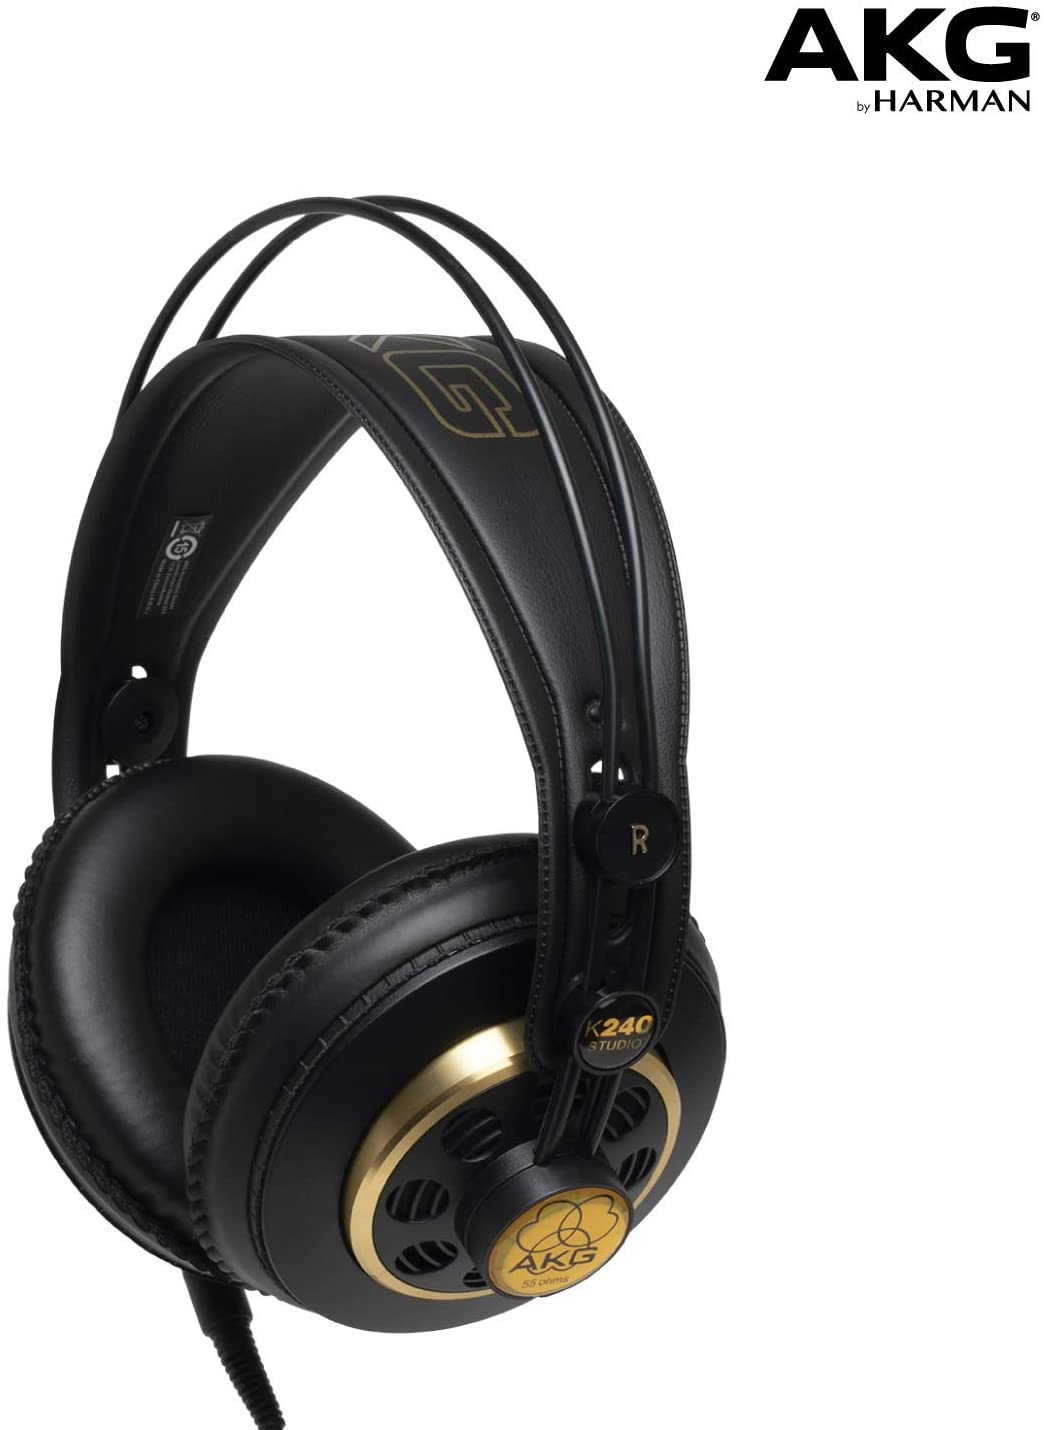 Headphones for VoiceOver artists professional recording studio at home. Home recording studio headphones.